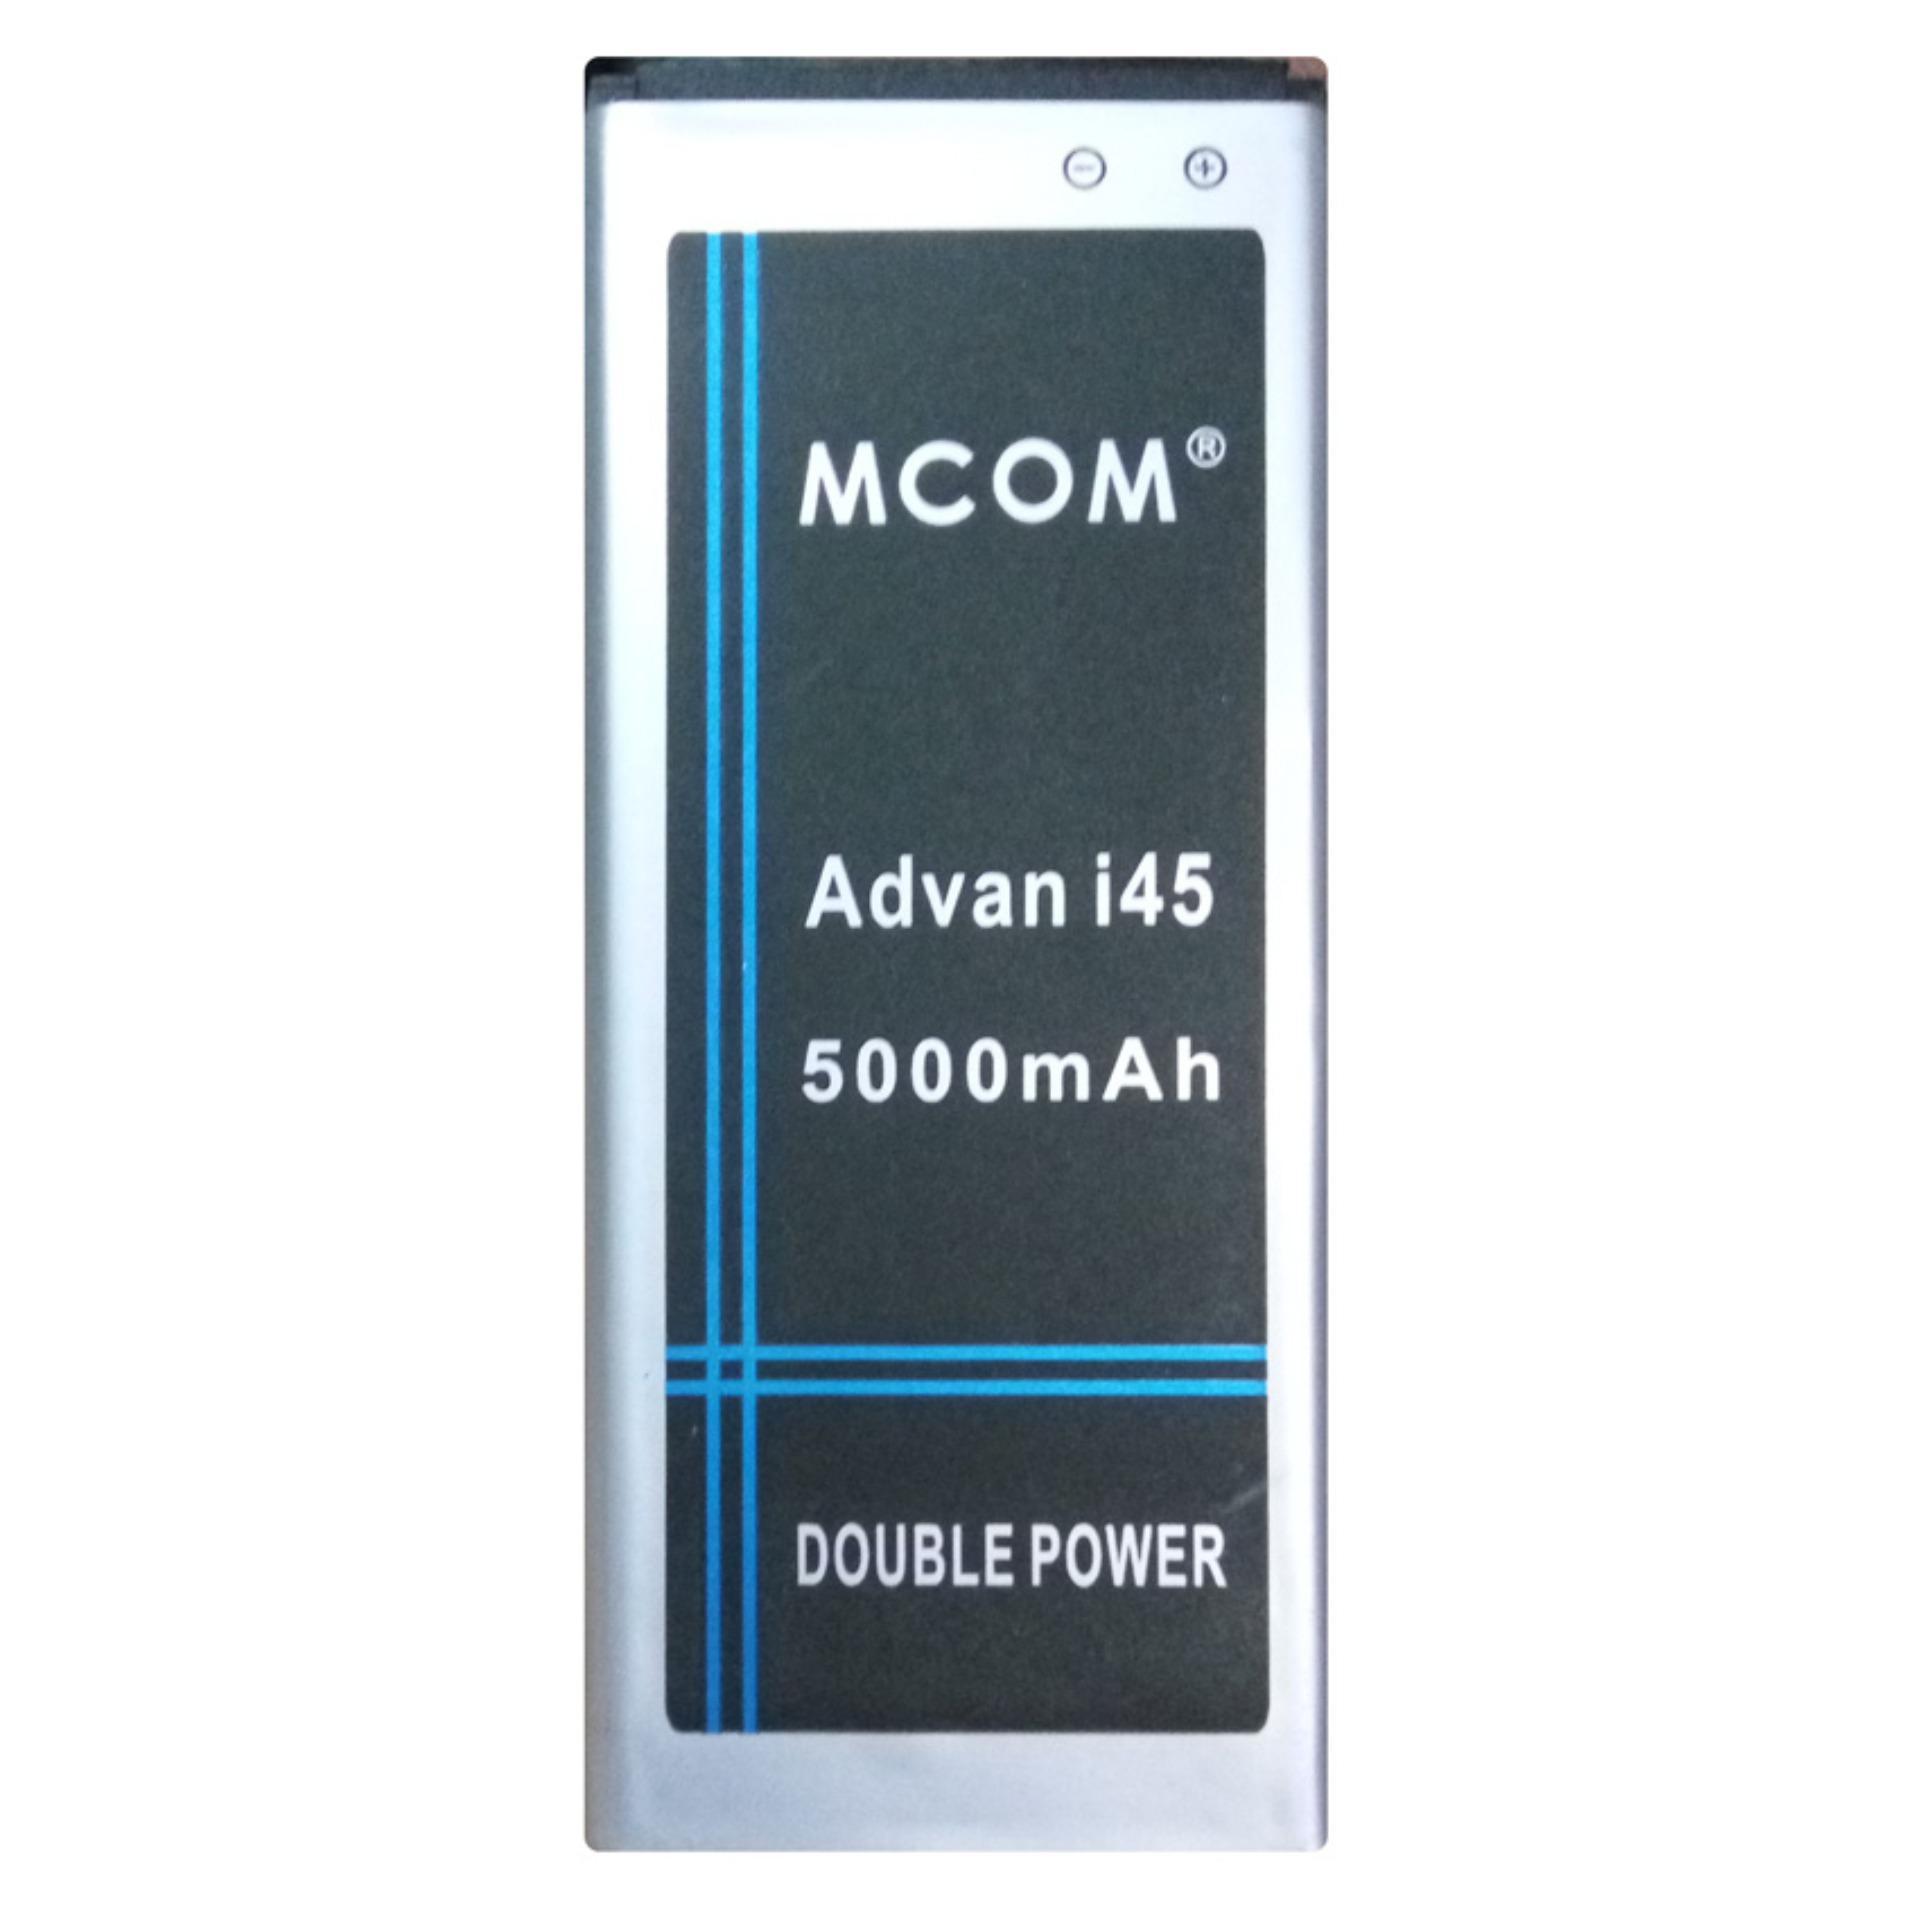 M-Com Baterai Double Power Battery for Advan i45 4G LTE - 5000 mAh